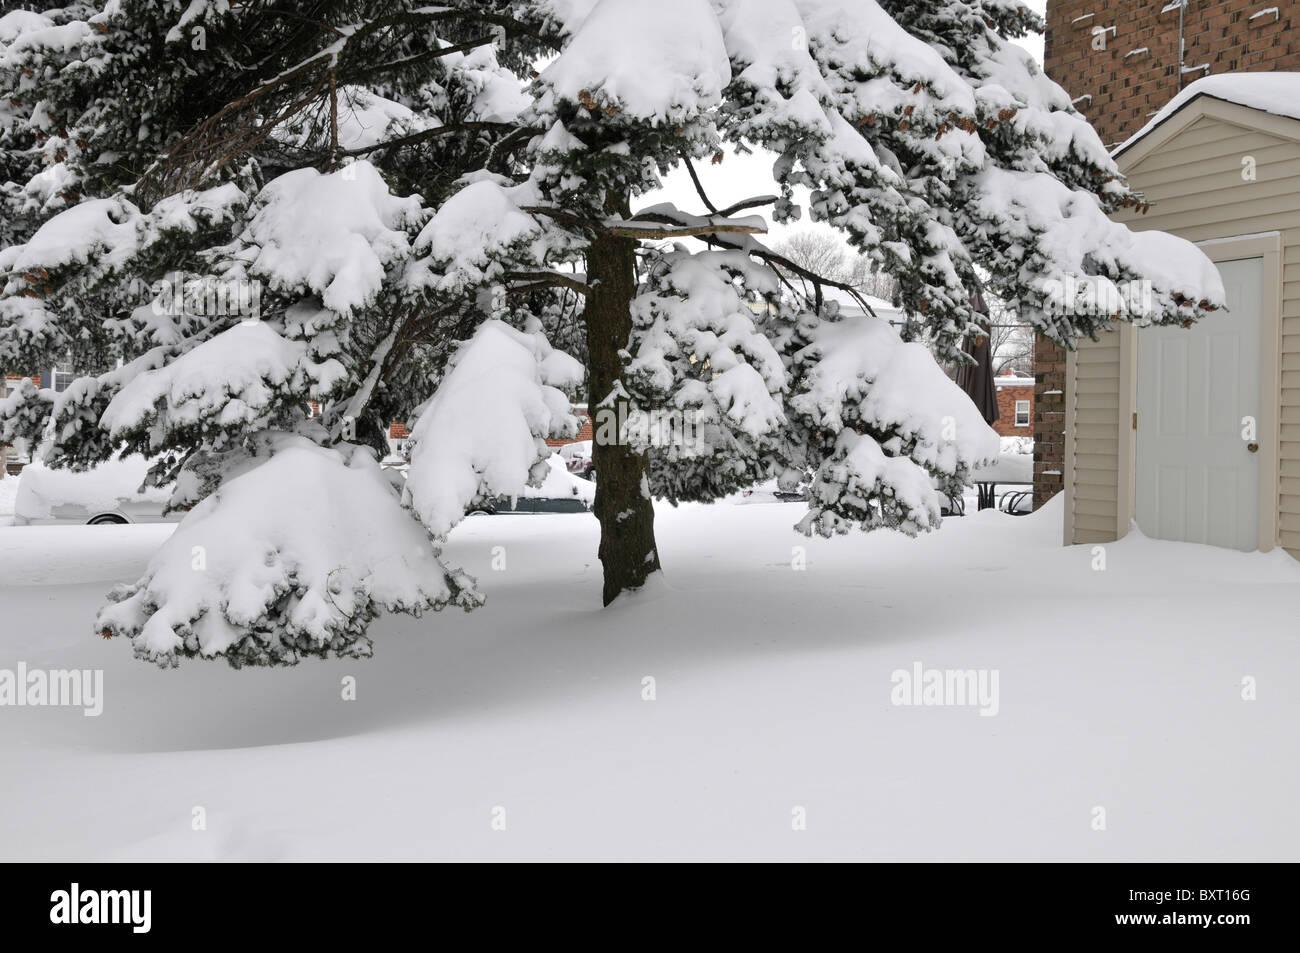 Conifer tree in the yard of condominium with snow,Philadelphia, PA, USA - Stock Image